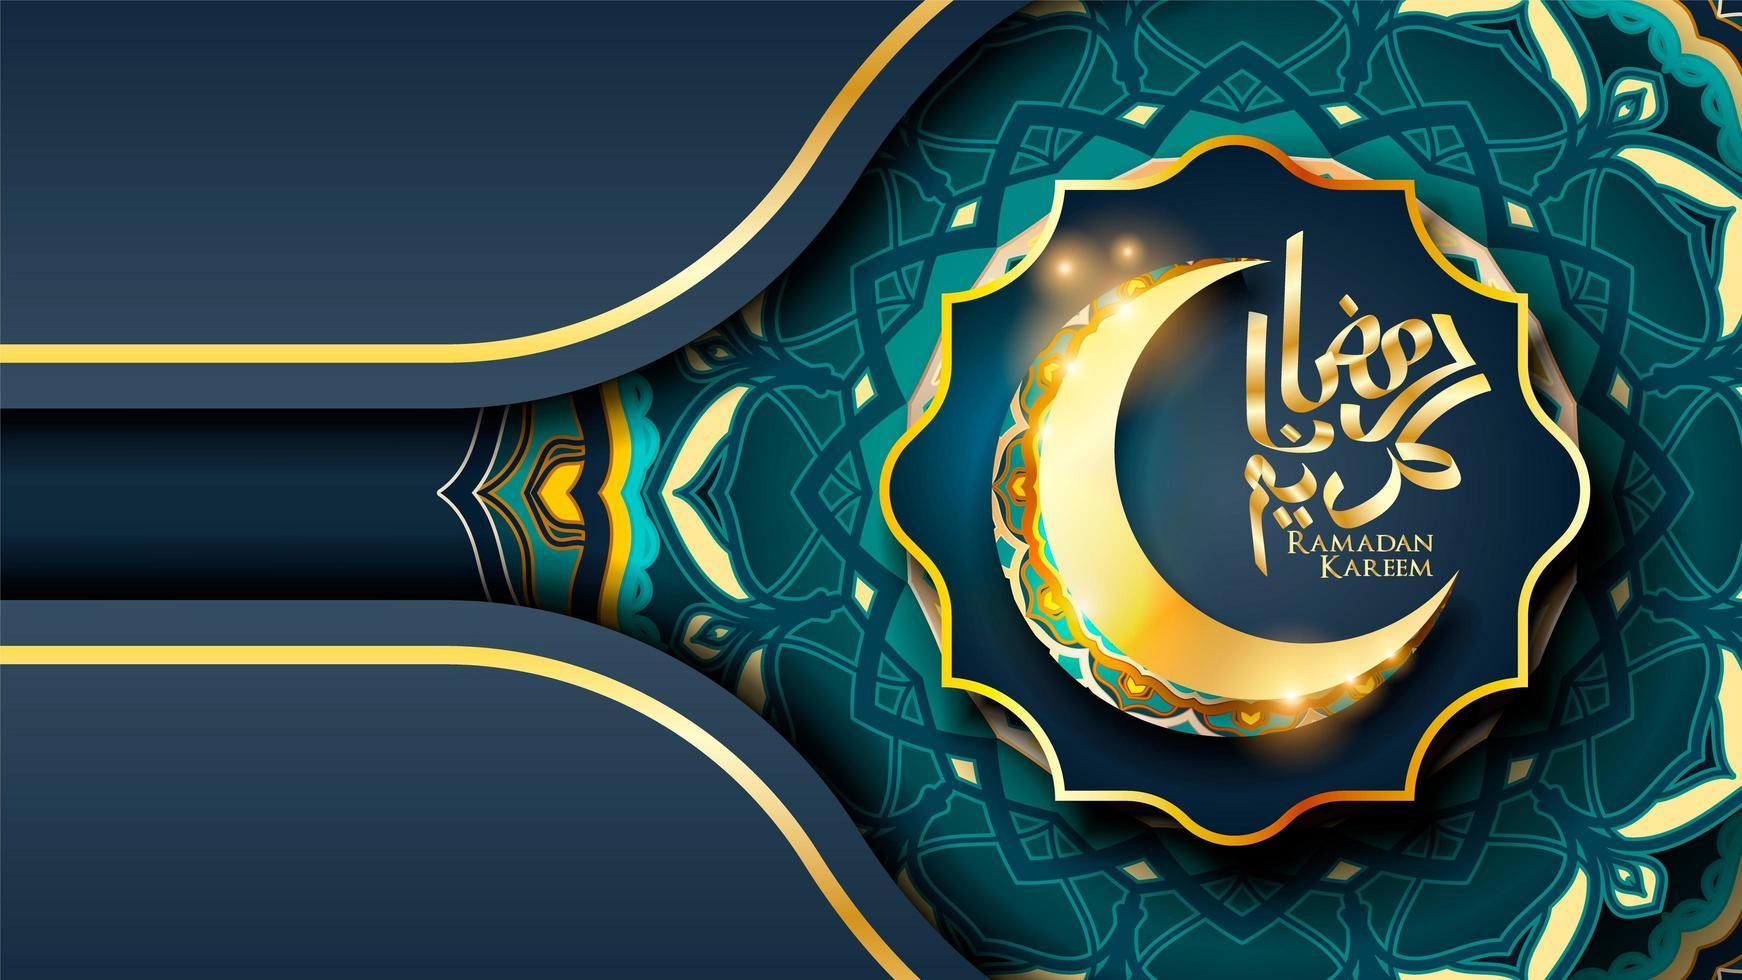 ramadan kareem design blu islamico con falce di luna vettore